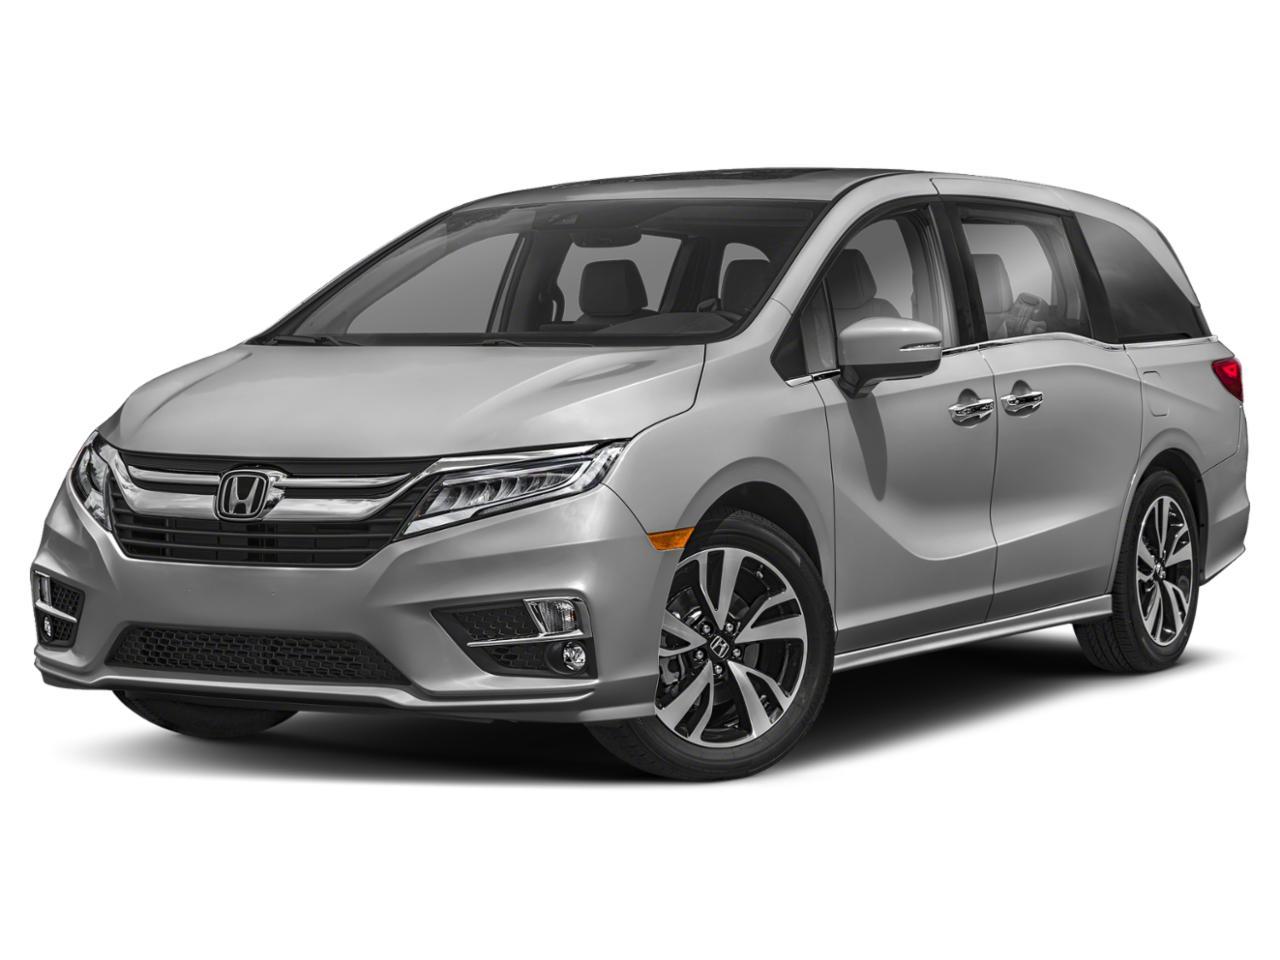 2019 Honda Odyssey Vehicle Photo in Muncy, PA 17756